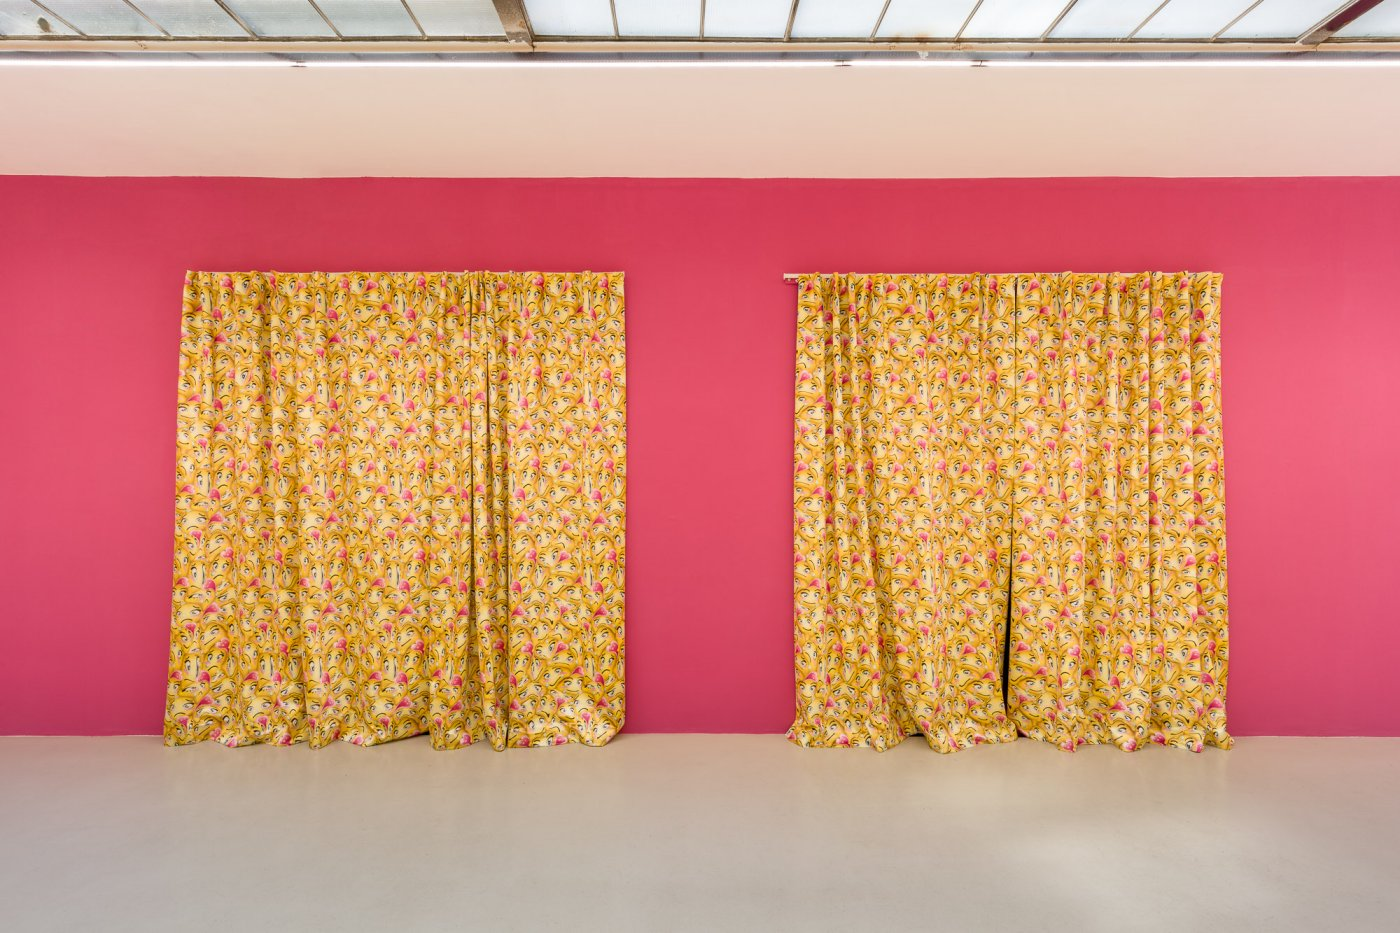 Galerie Kandlhofer Rachel Maclean new 4